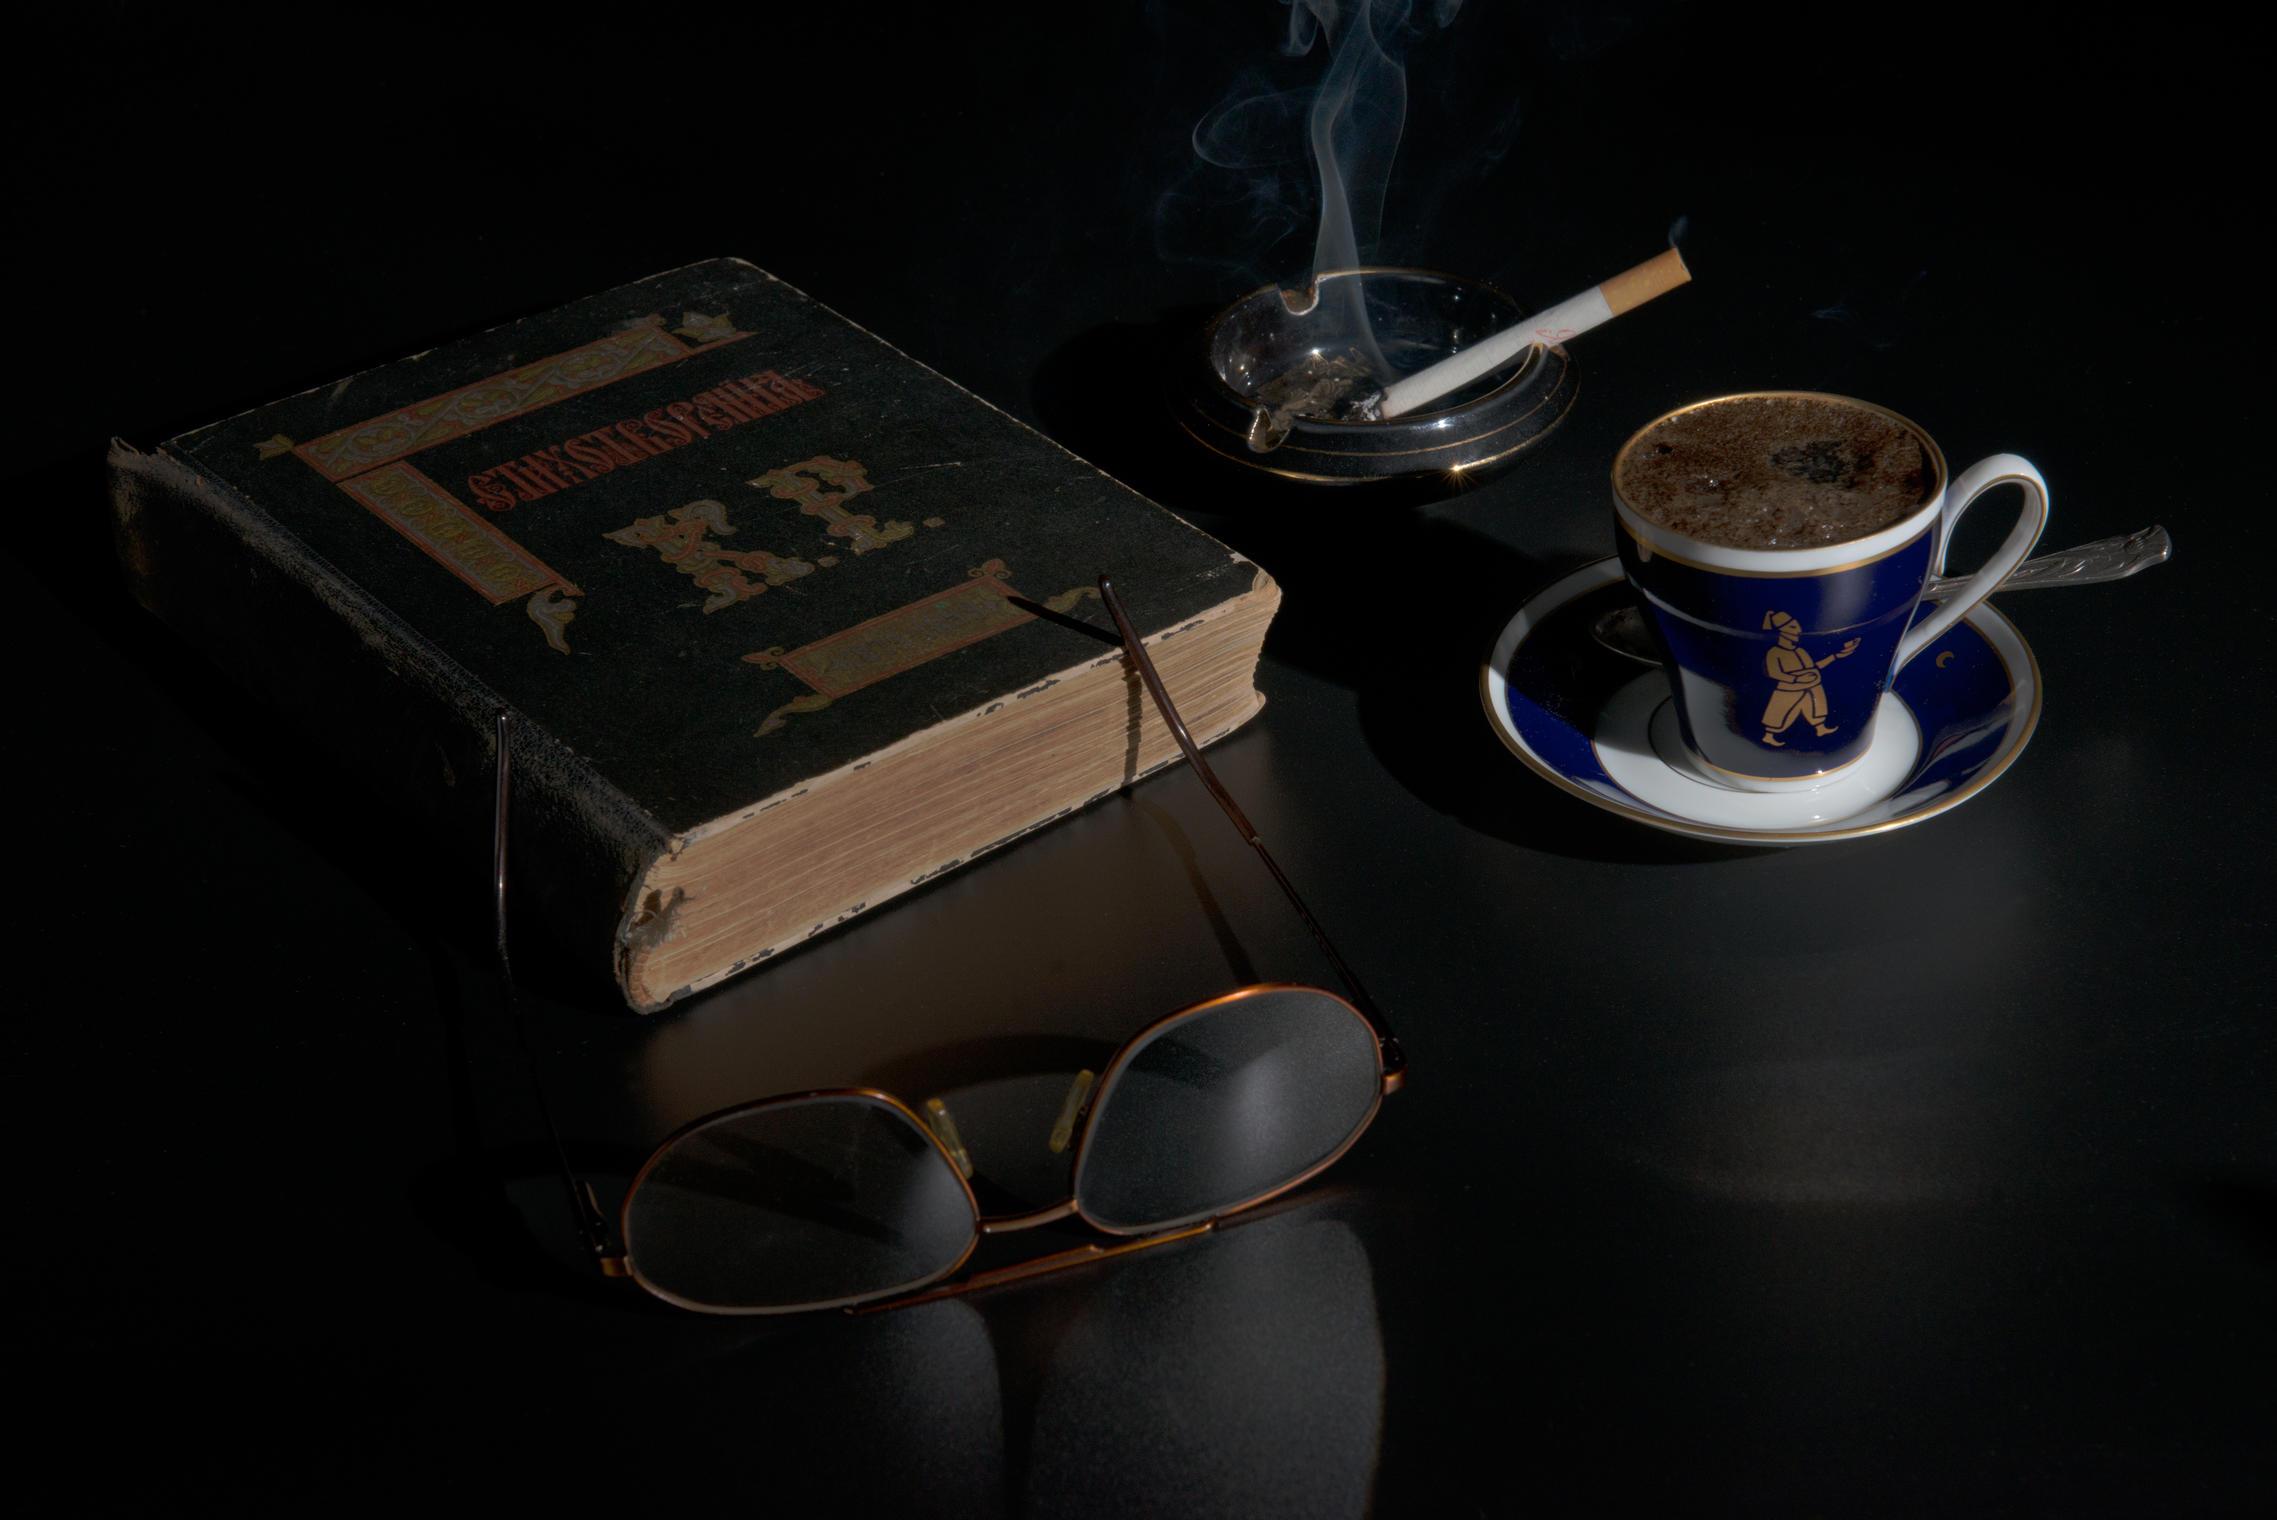 Сигареты и книги картинки